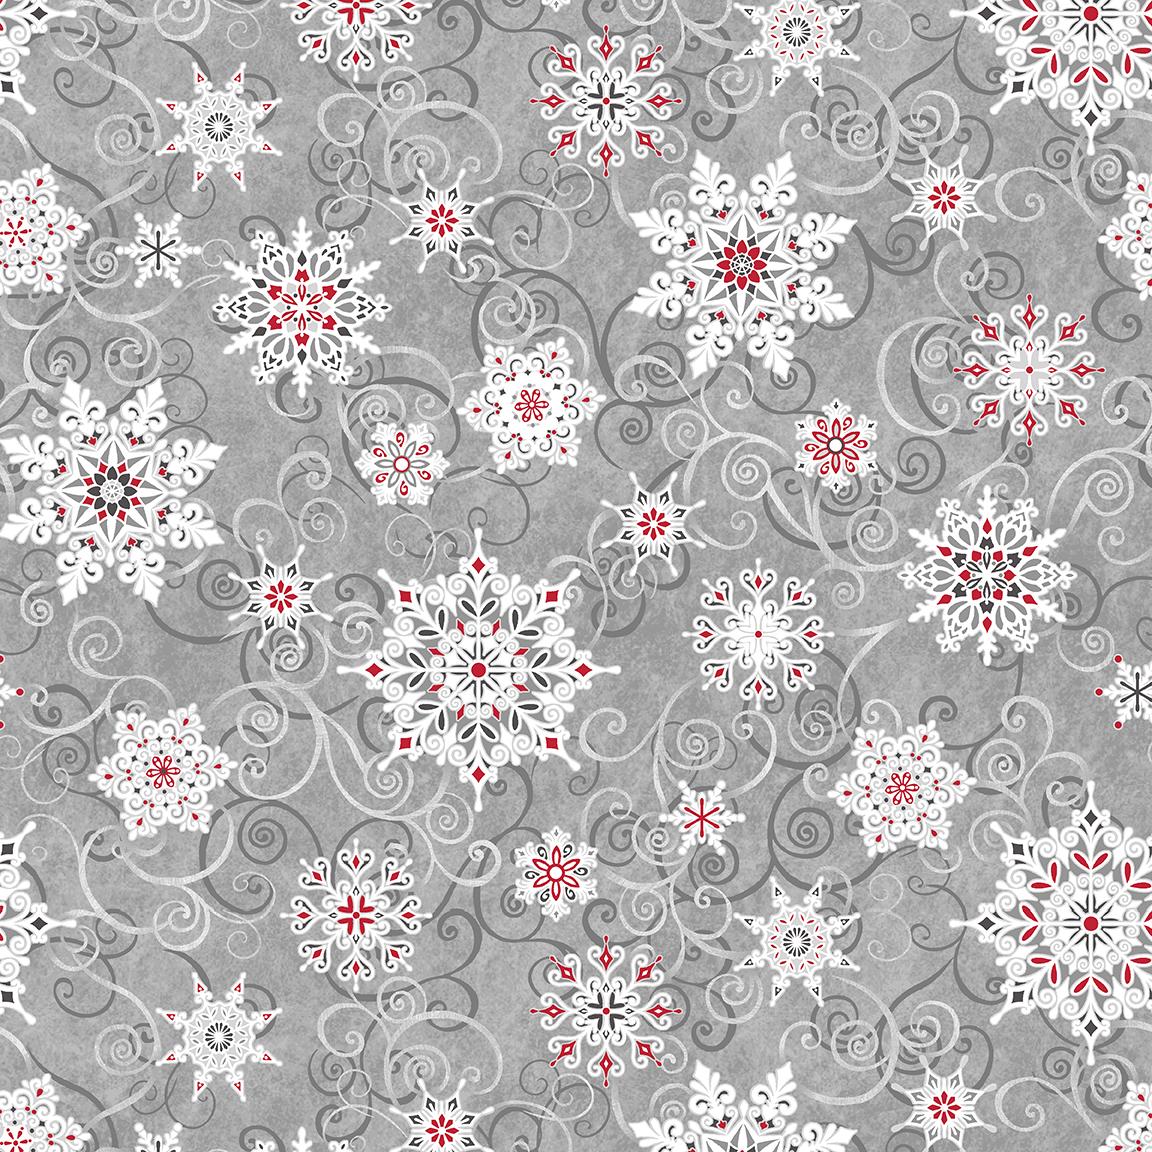 Snowflakes on Grey Swirls Wide Back - Frozen Melodies by Chelsea DesignWorks